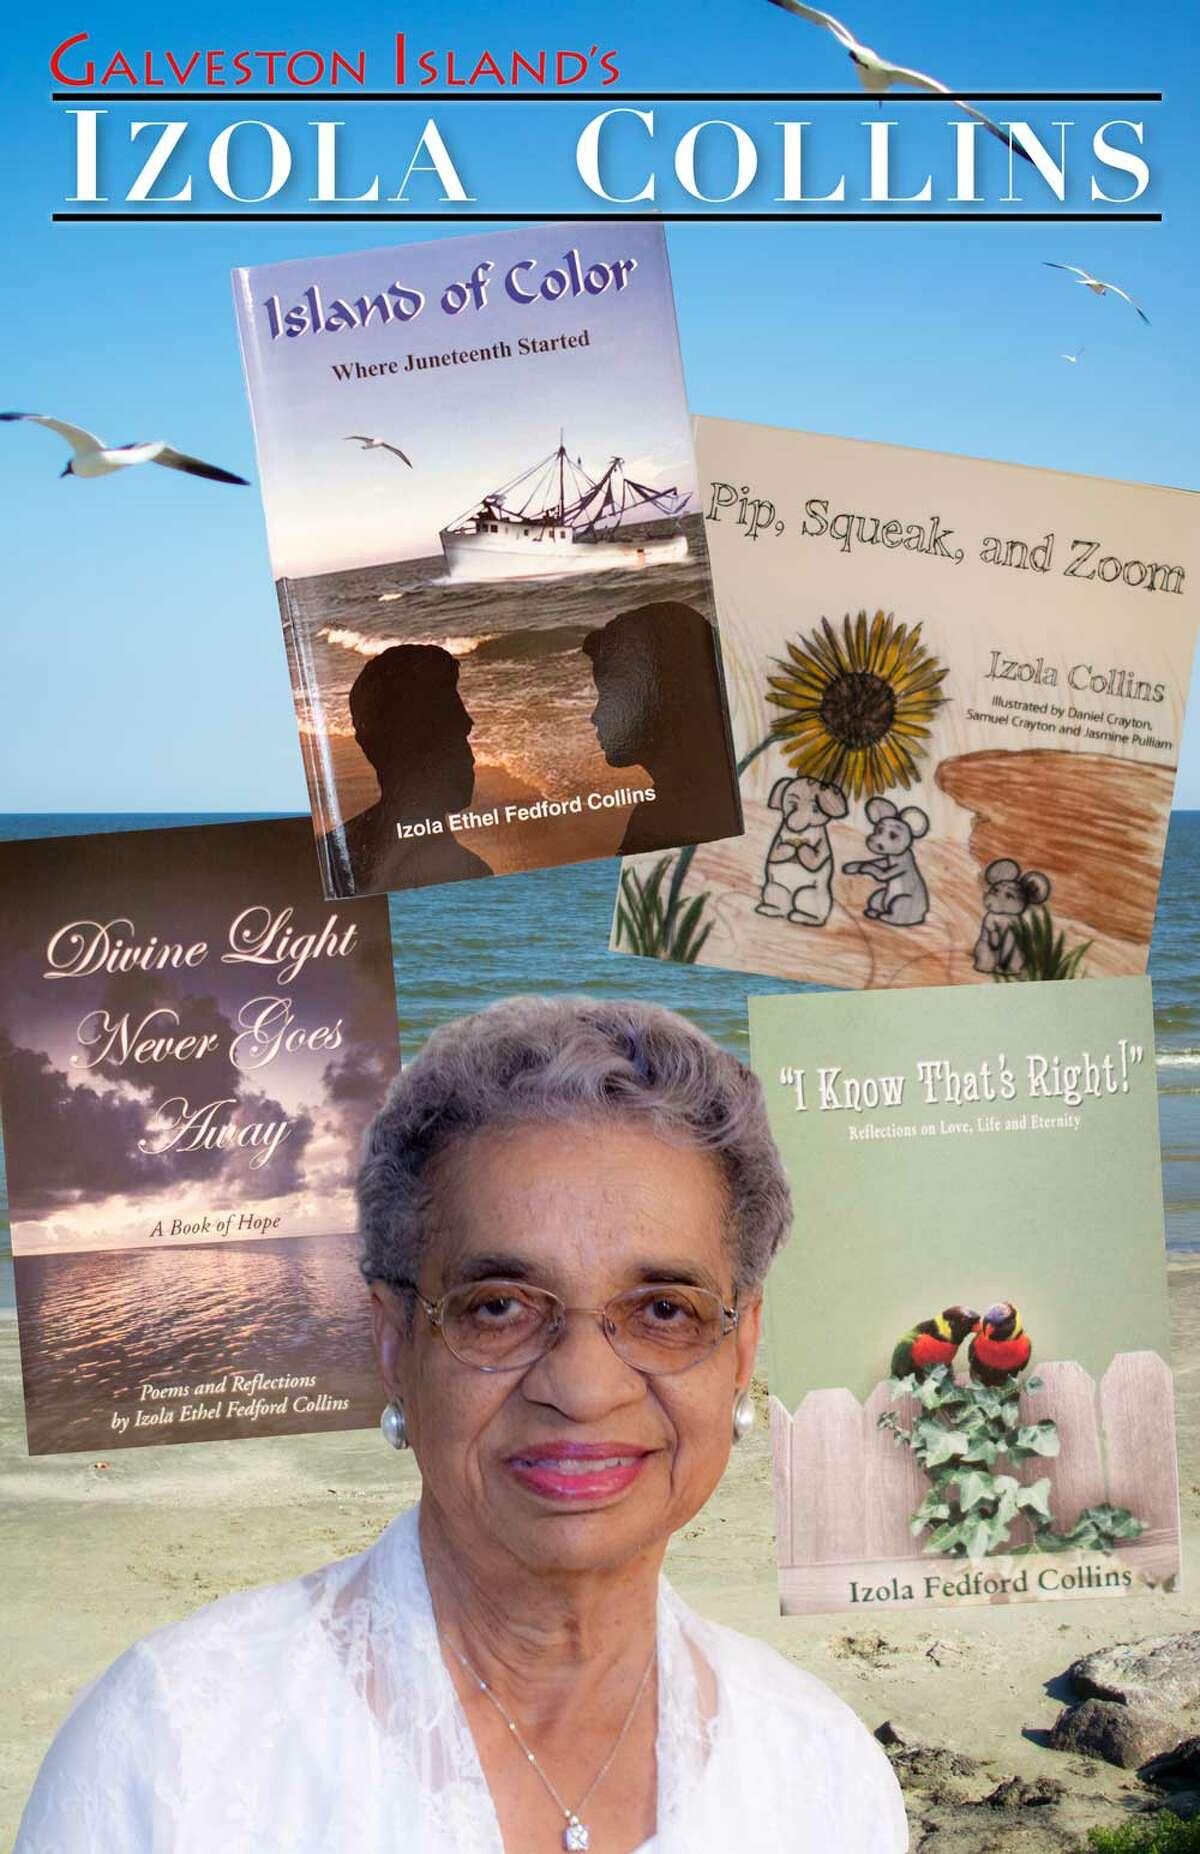 Izola Collins on the bookcover of